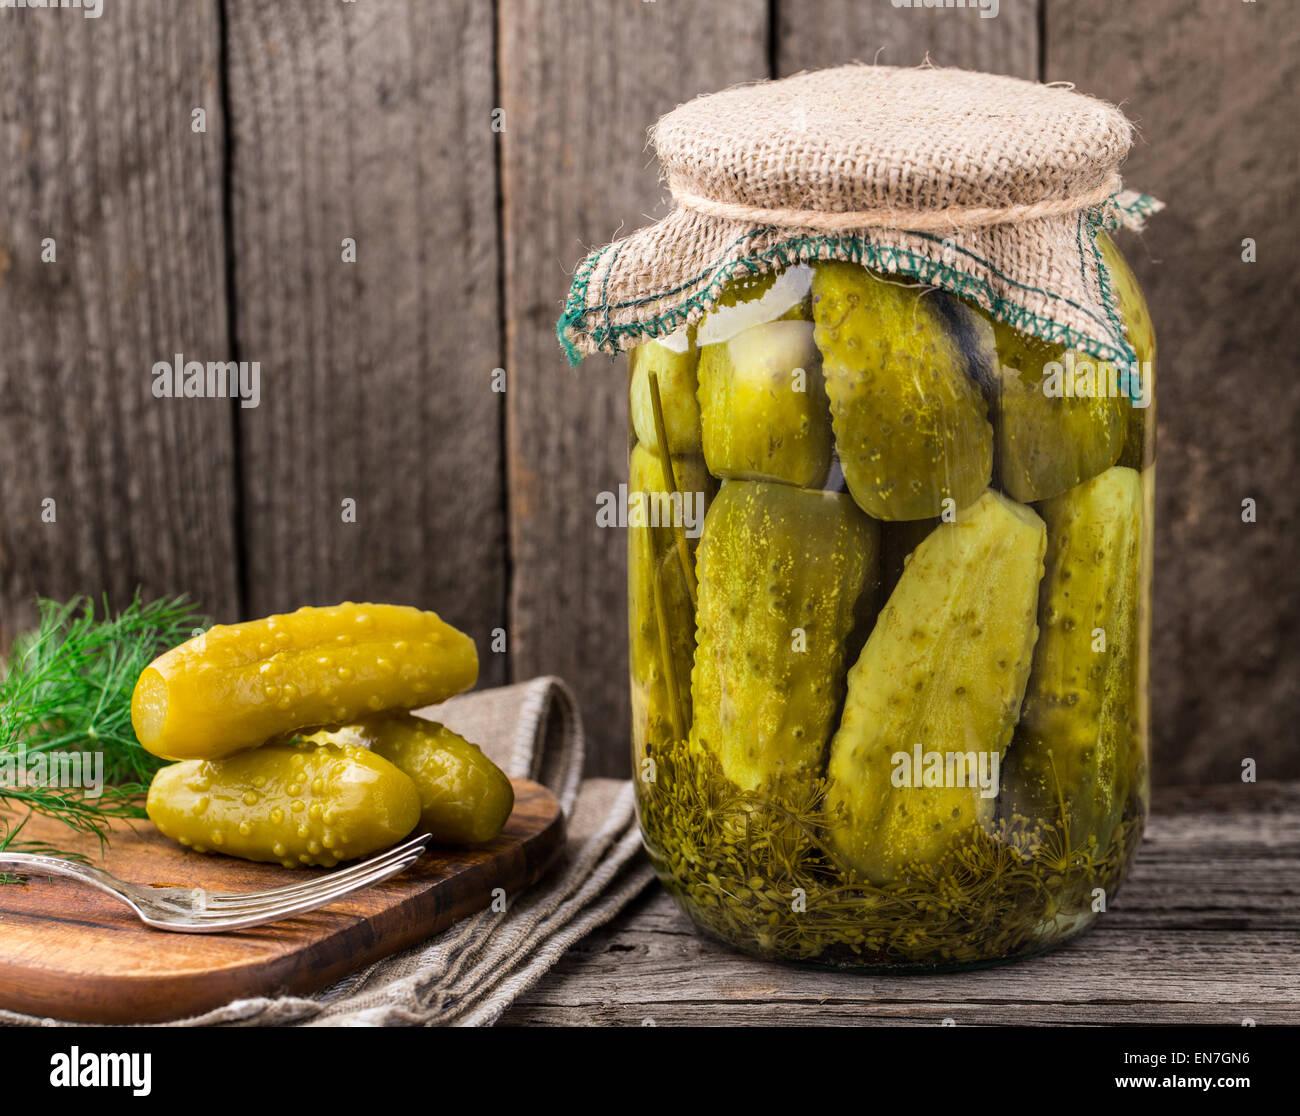 Jar of pickles - Stock Image